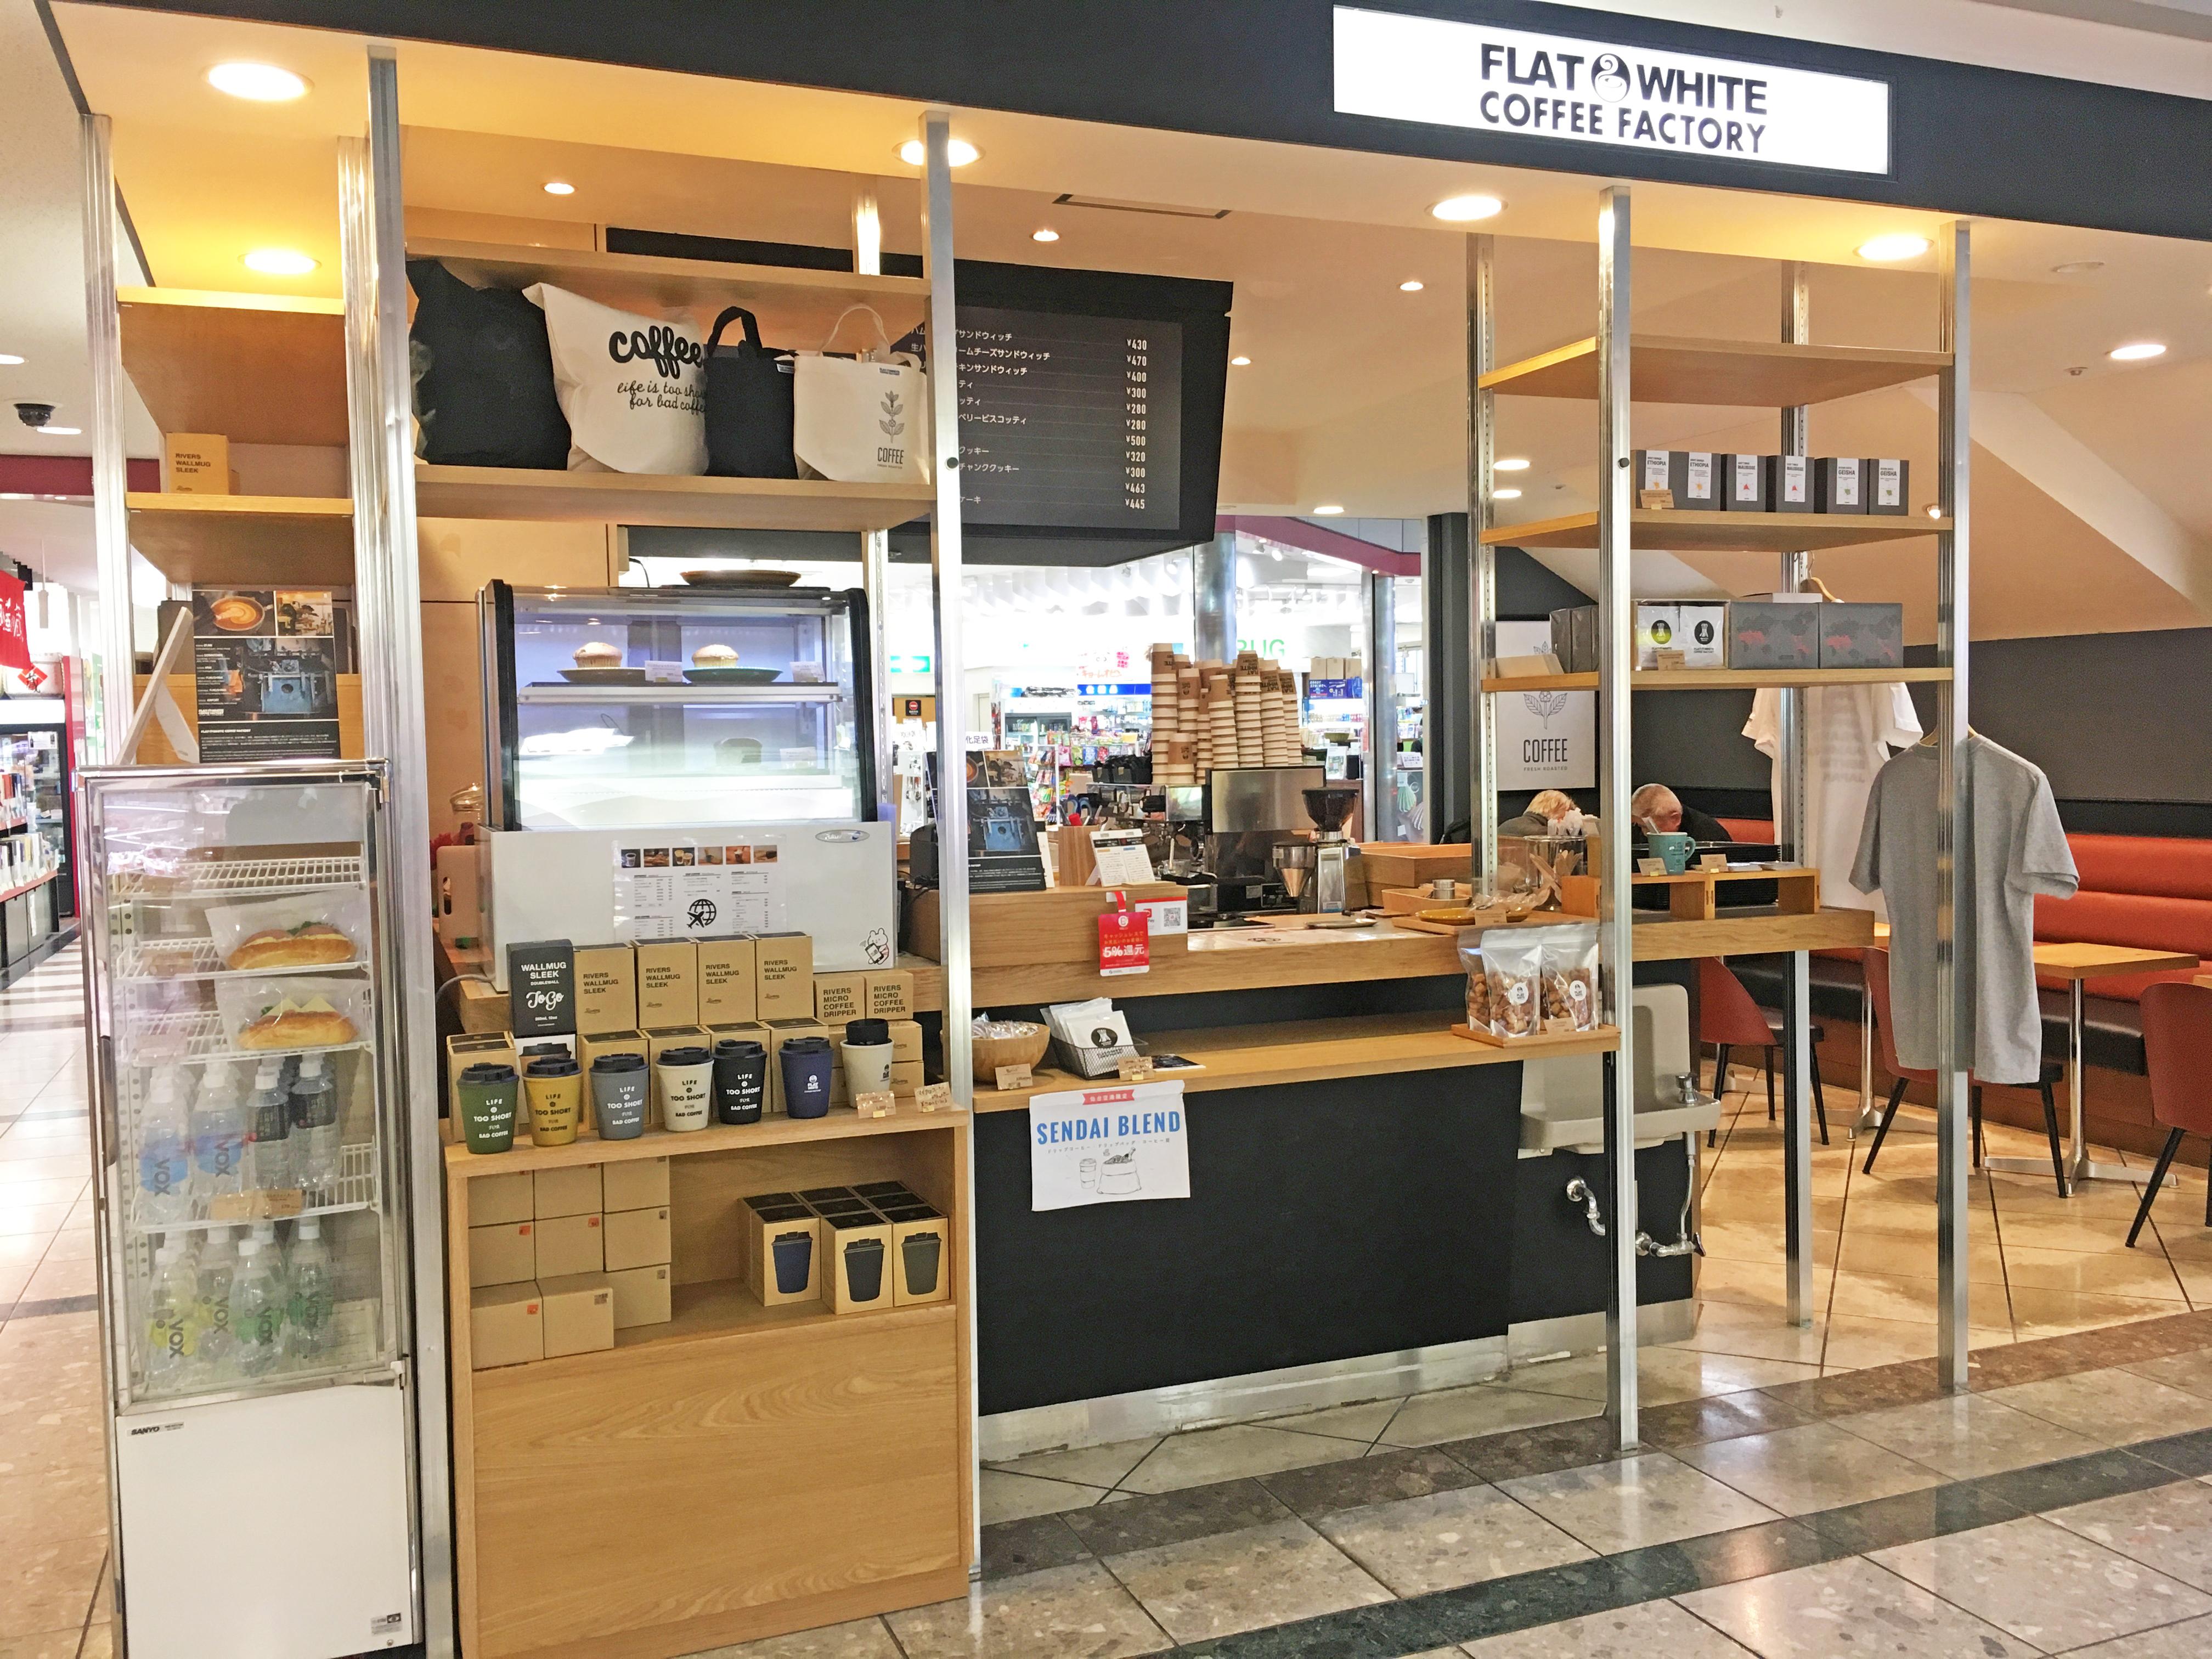 FLATWHITE COFFEE FACTORY 仙台機場店